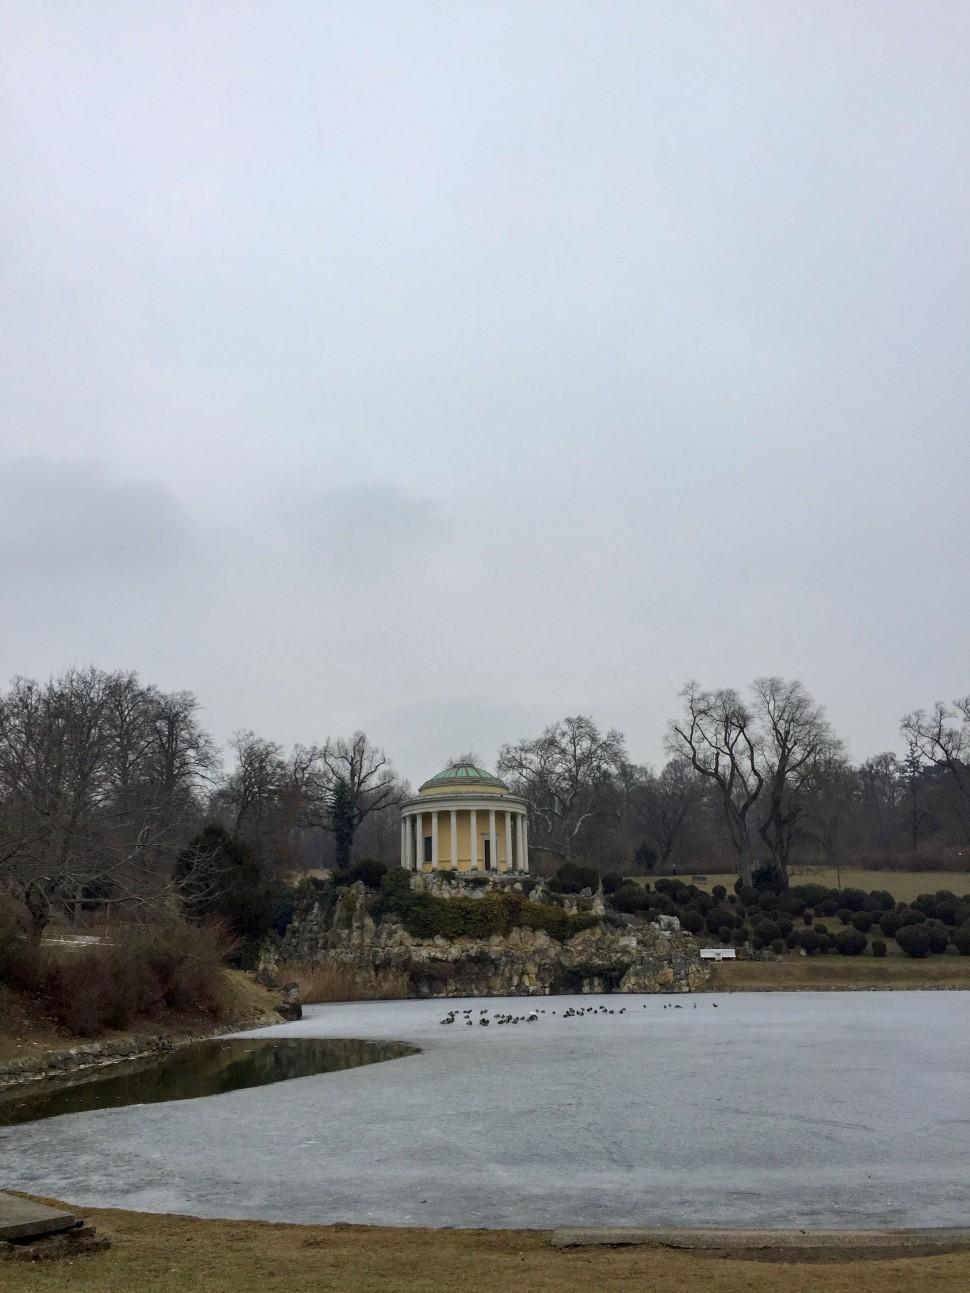 Burgenland_Eisenstadt_park_leopoldine temple_nice